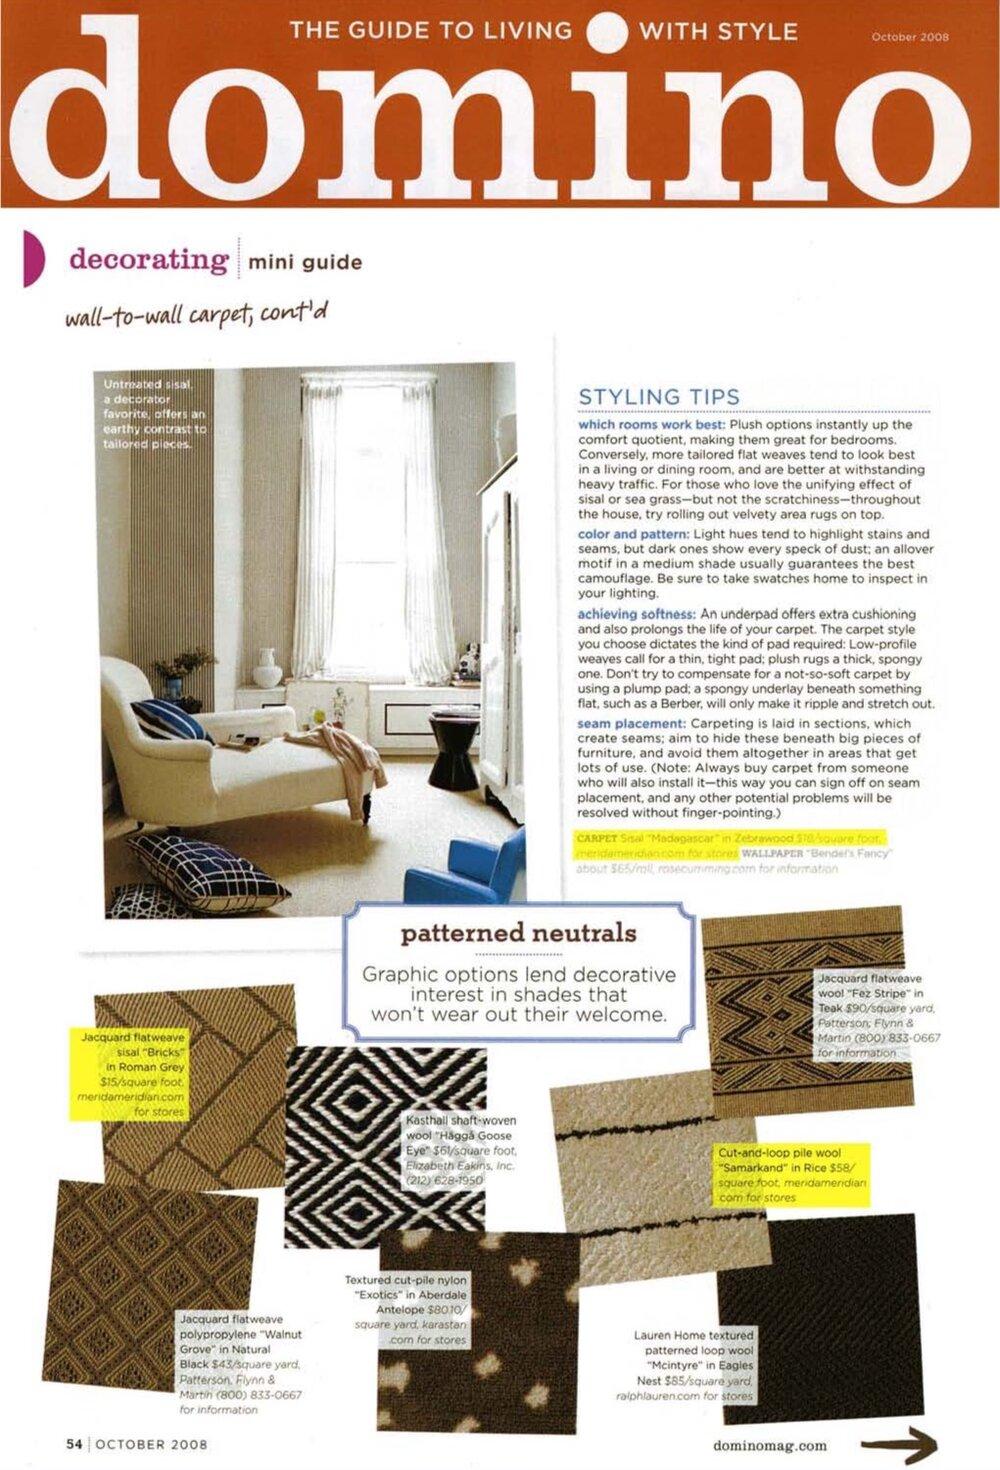 Domino: October 2008 featuring Bricks